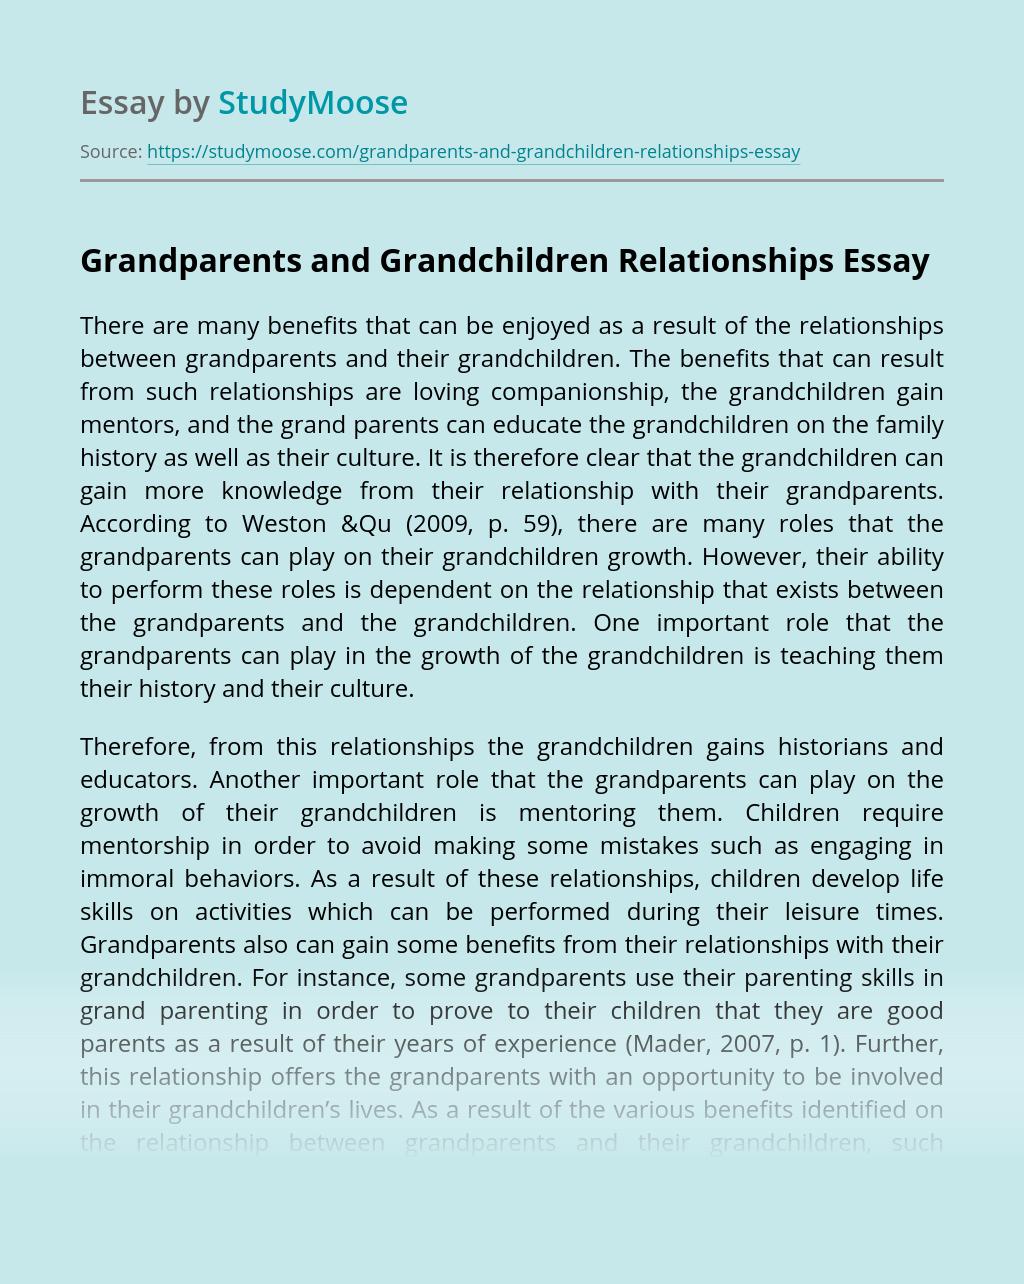 Grandparents and Grandchildren Relationships